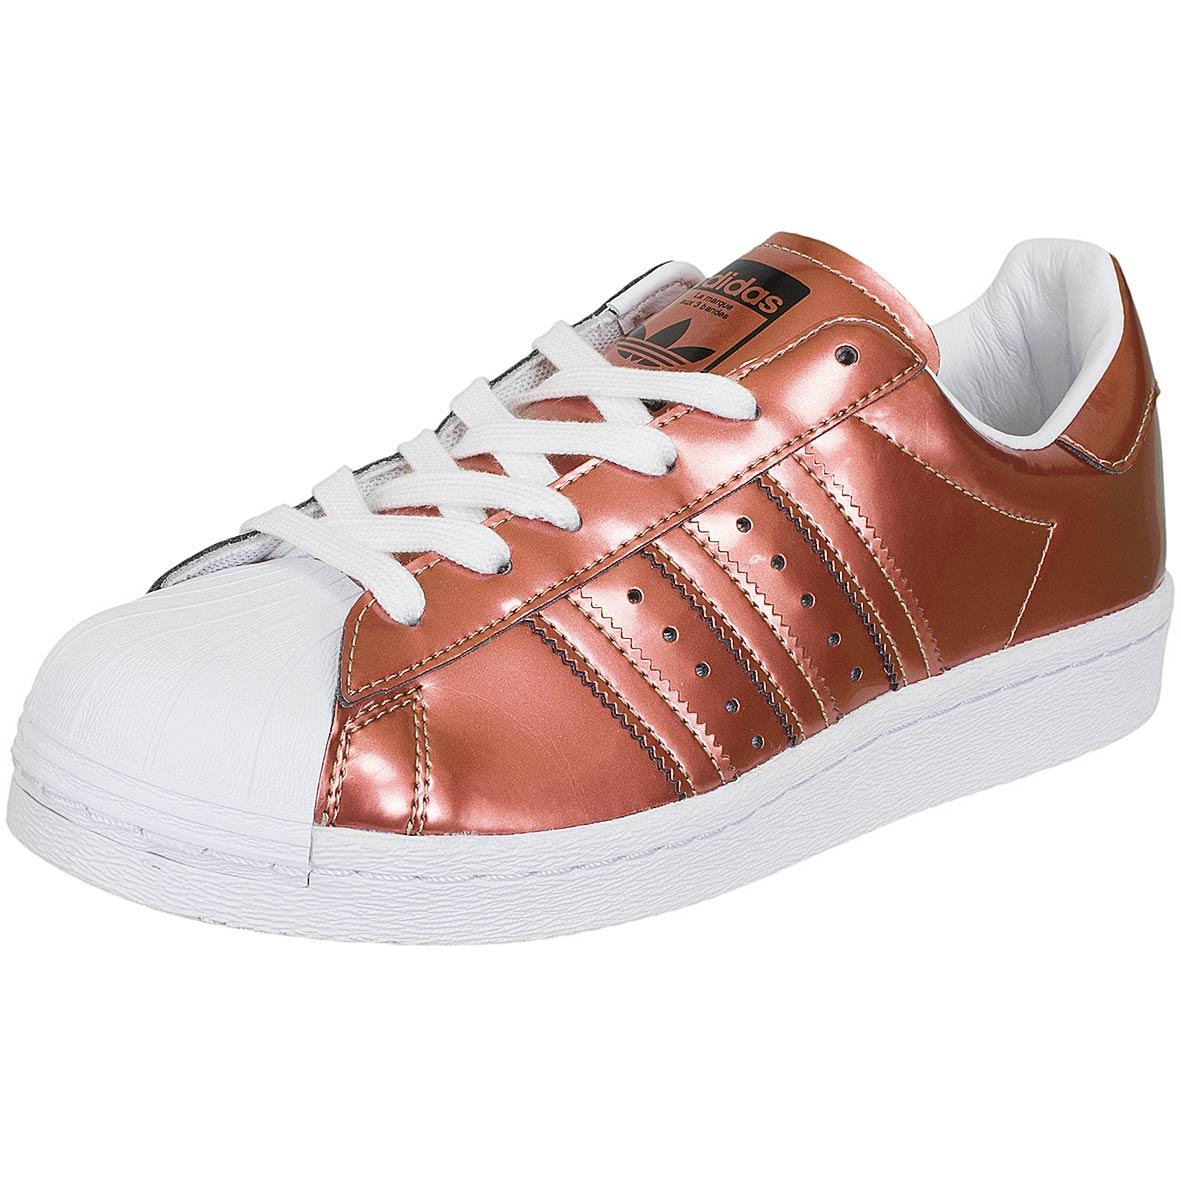 popular stores aliexpress detailed look Adidas Originals Damen Sneaker Superstar kupfer/weiß